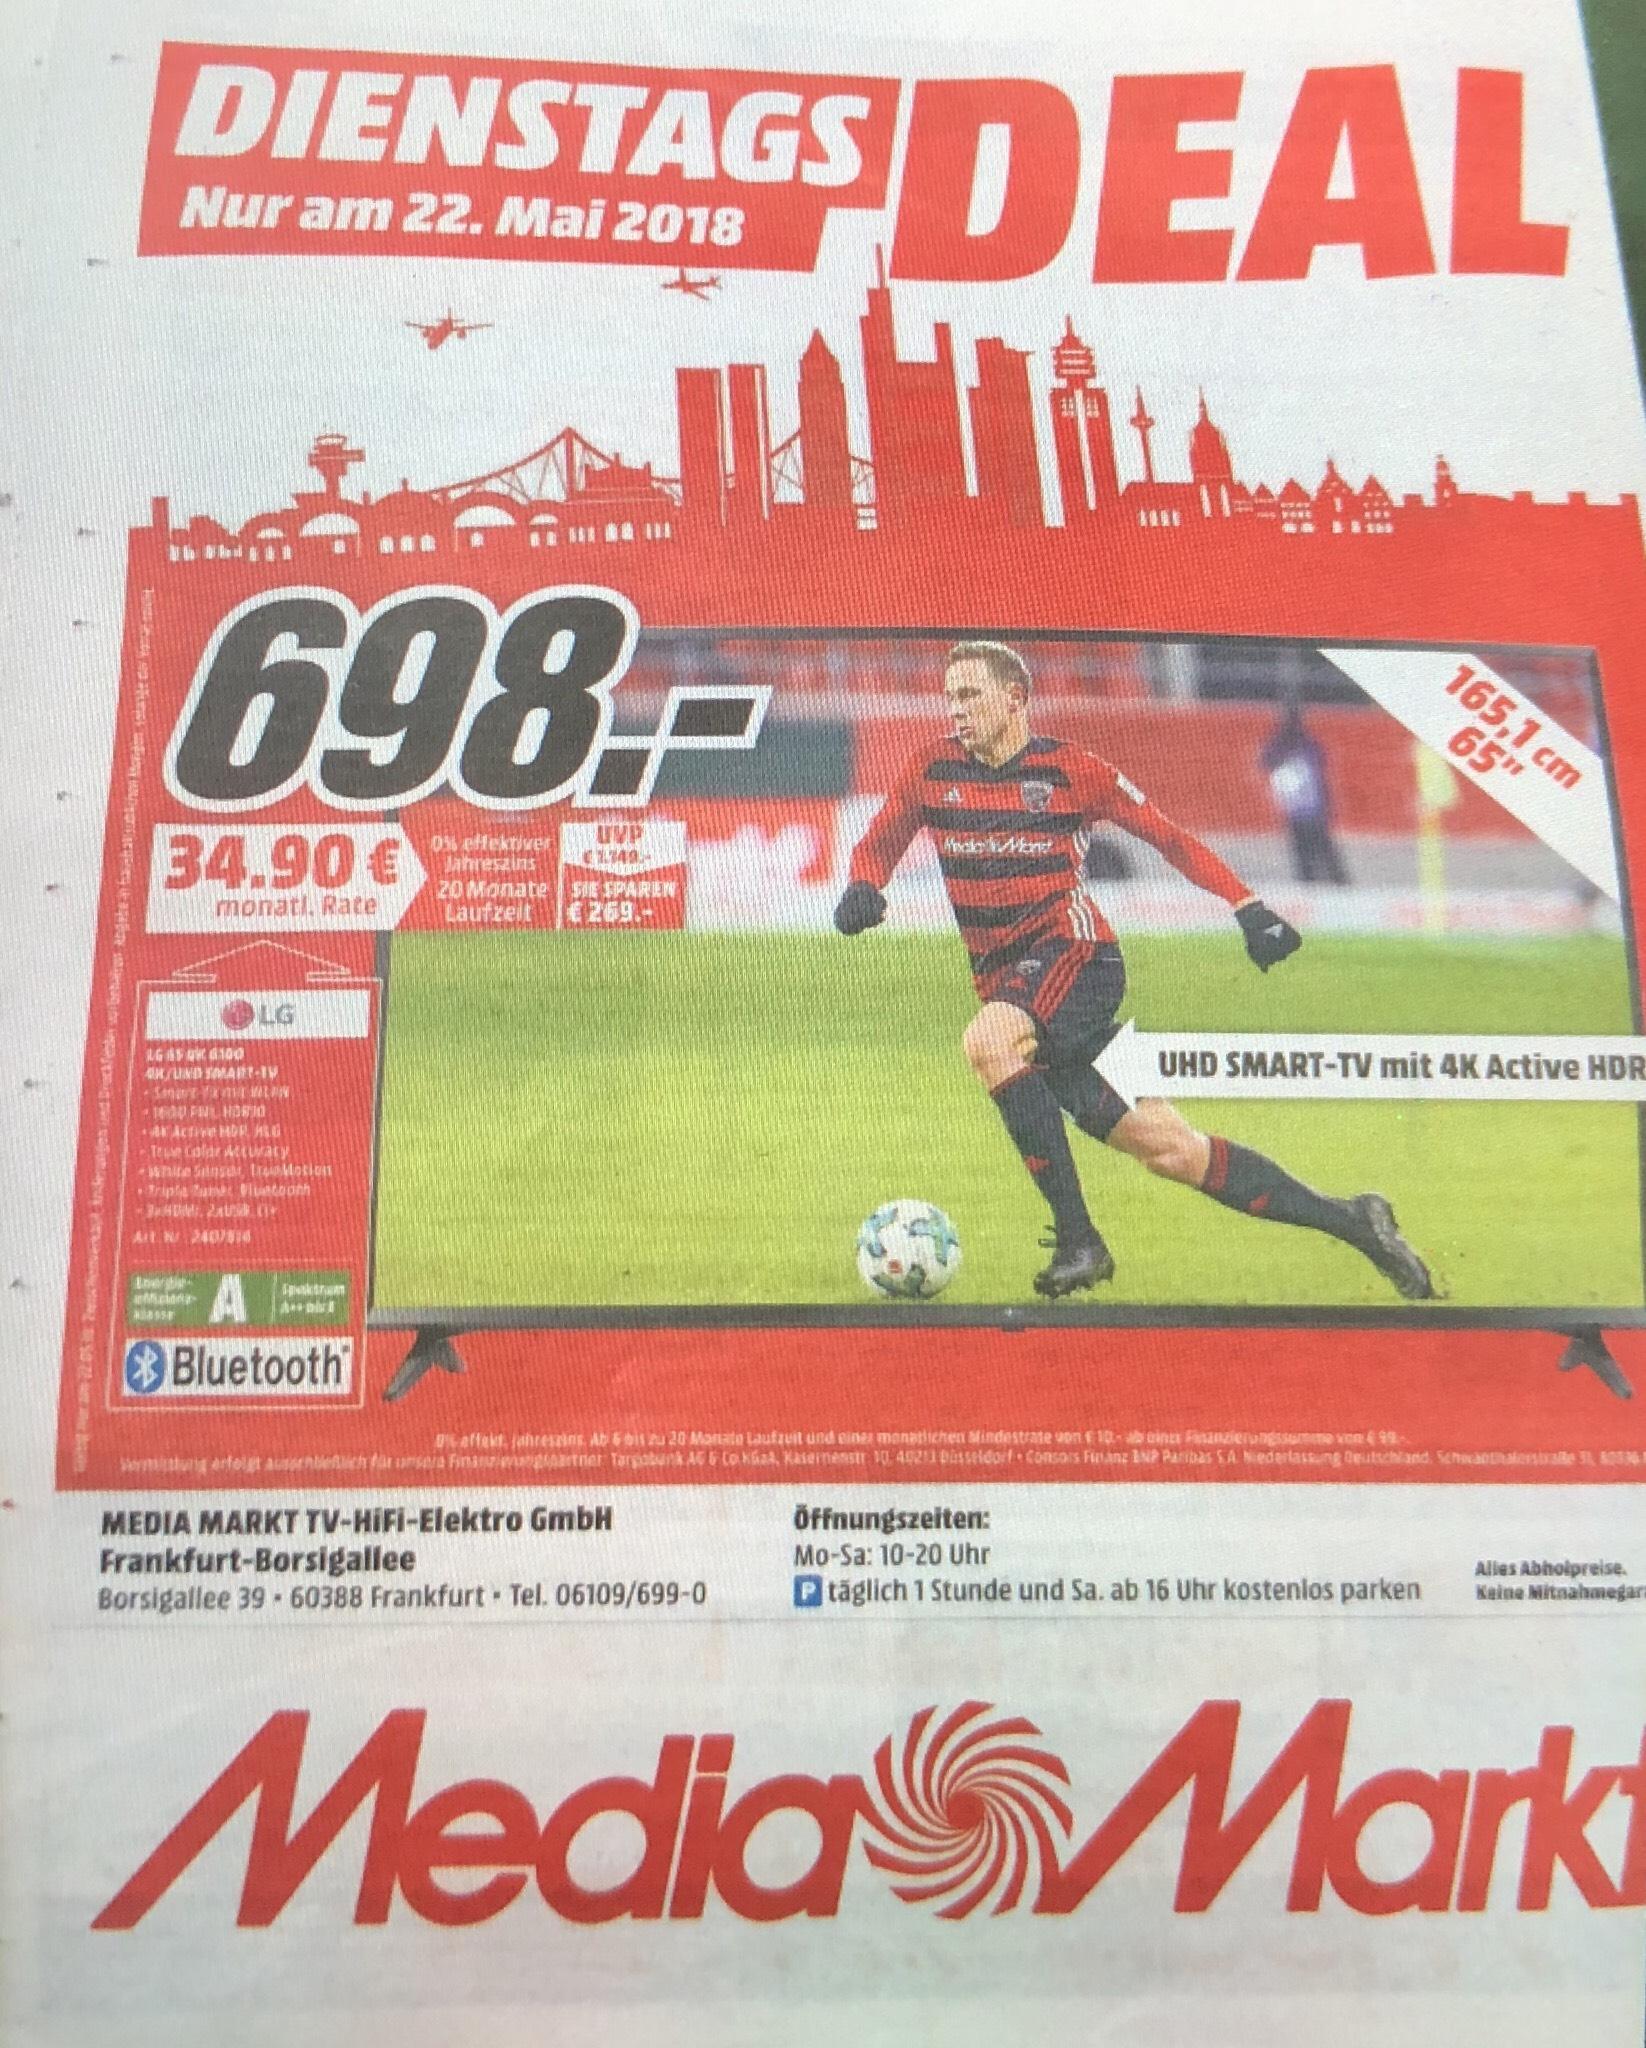 "LG 65UK6100 UHD TV ""DienstagsDEAL"" nur am 22.Mai.18 im Mediamarkt Borsigallee Frankfurt!"